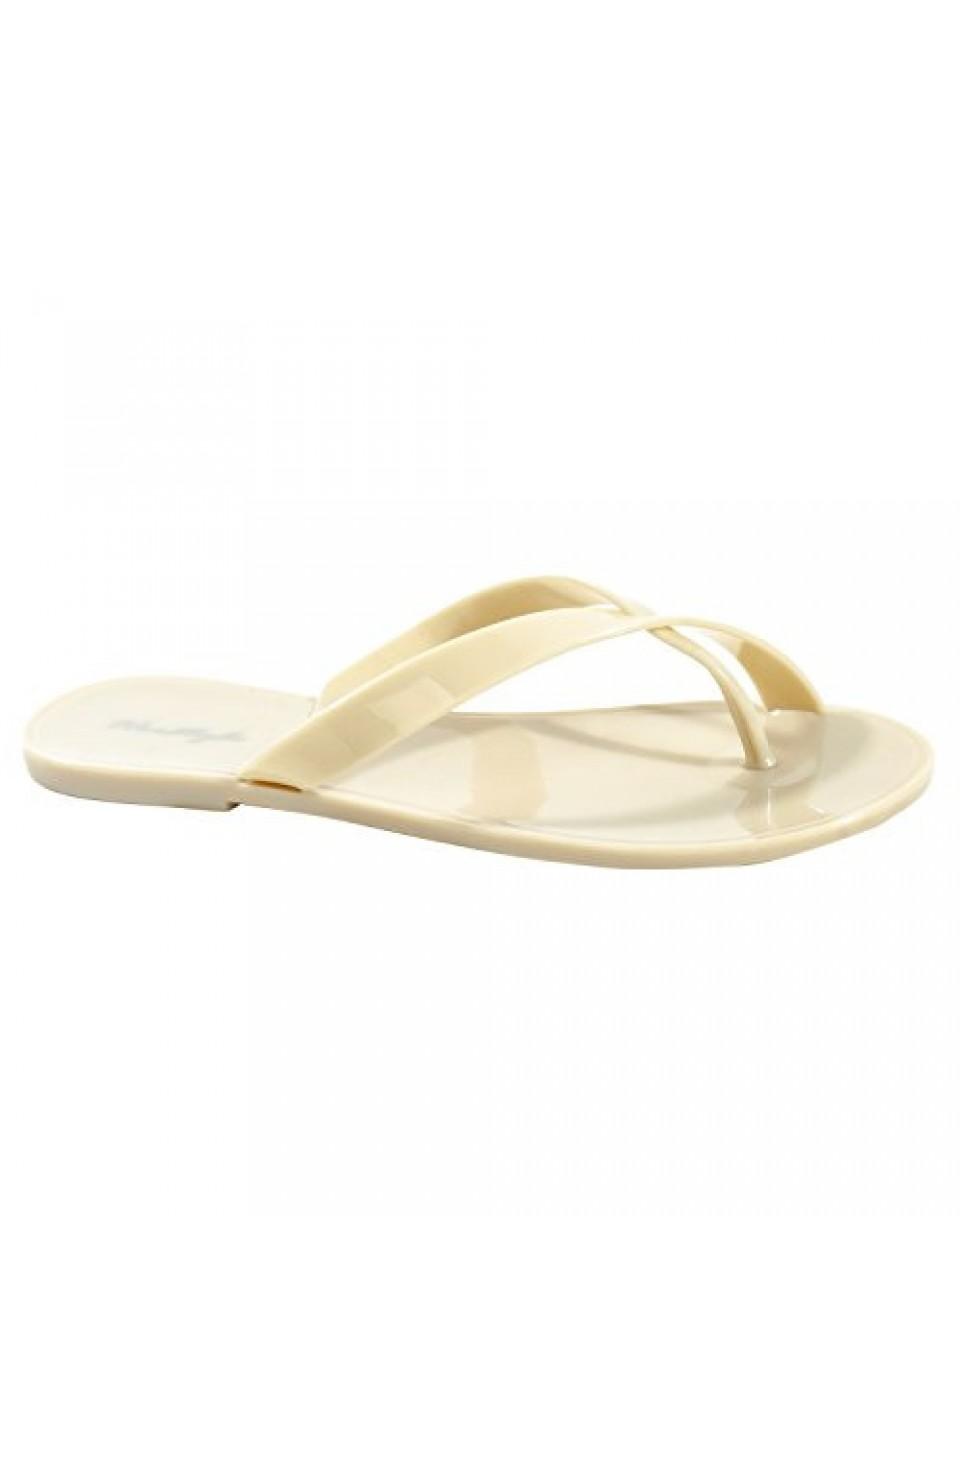 Women's Nude Manmade Saona Flat Jelly Sandal with Crisscross Thong Strap